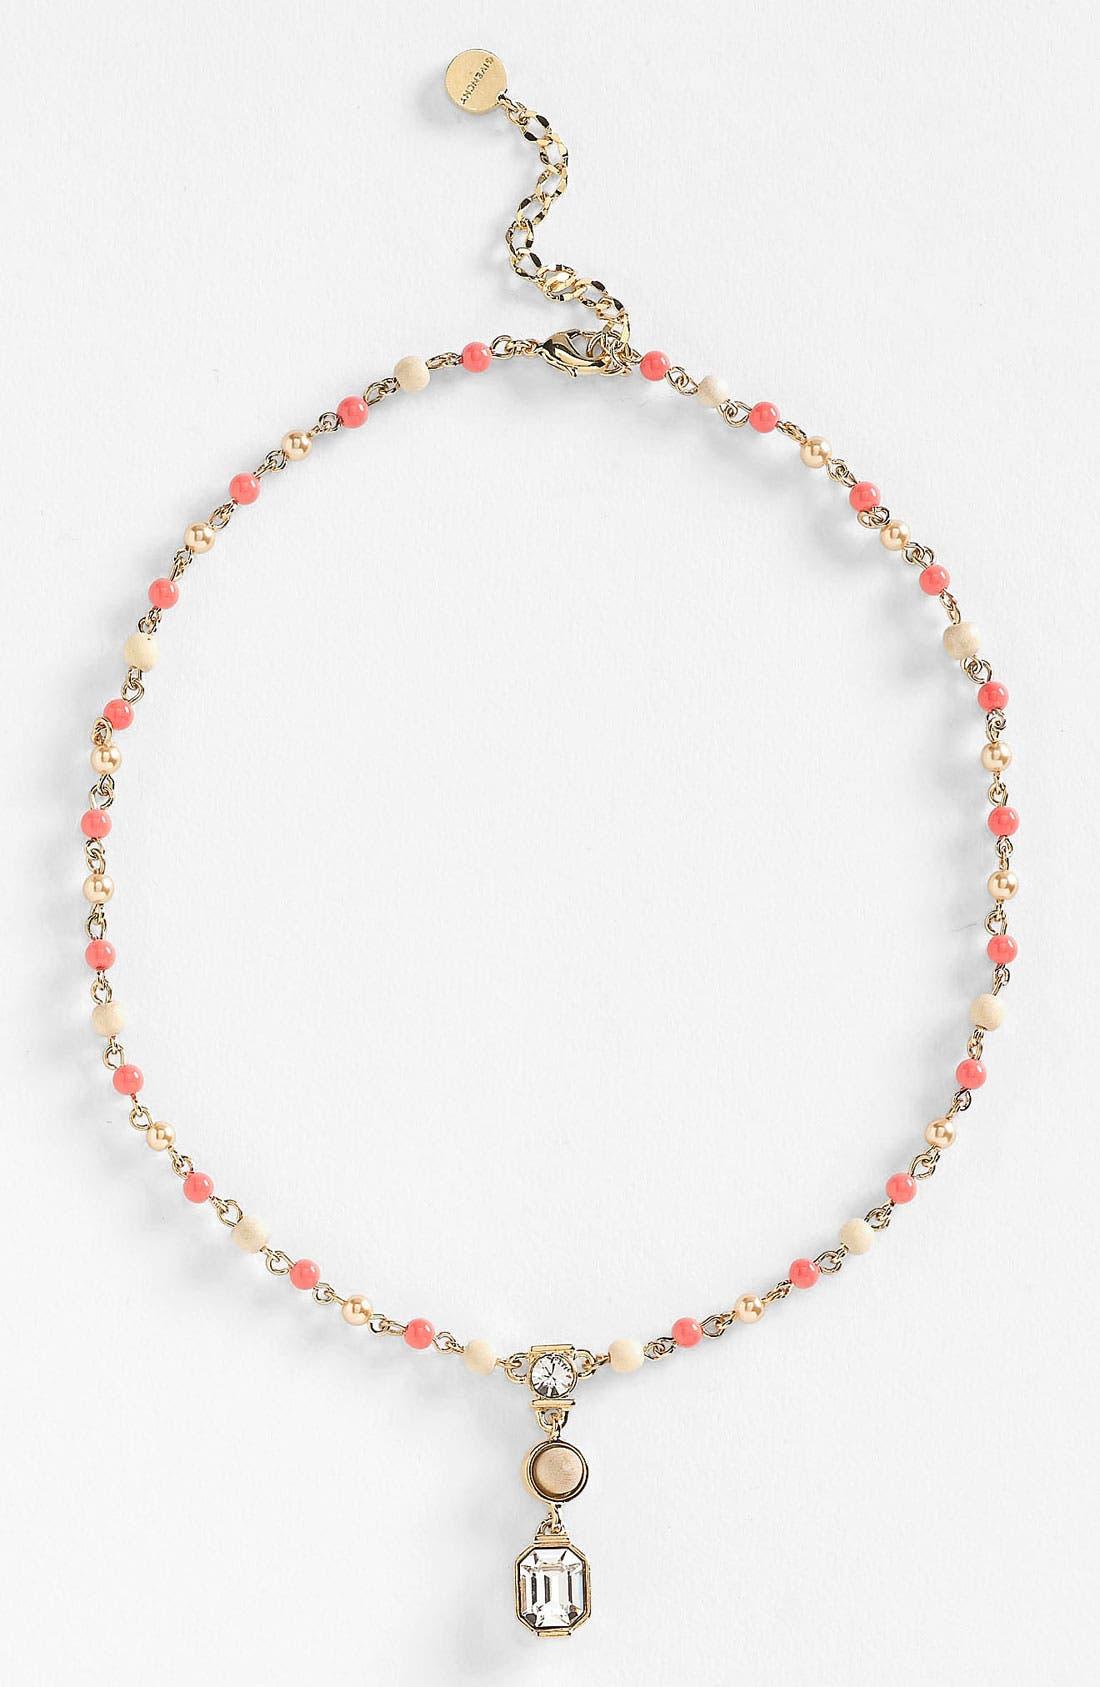 Main Image - Givenchy 'Lark' Crystal & Bead Pendant Necklace